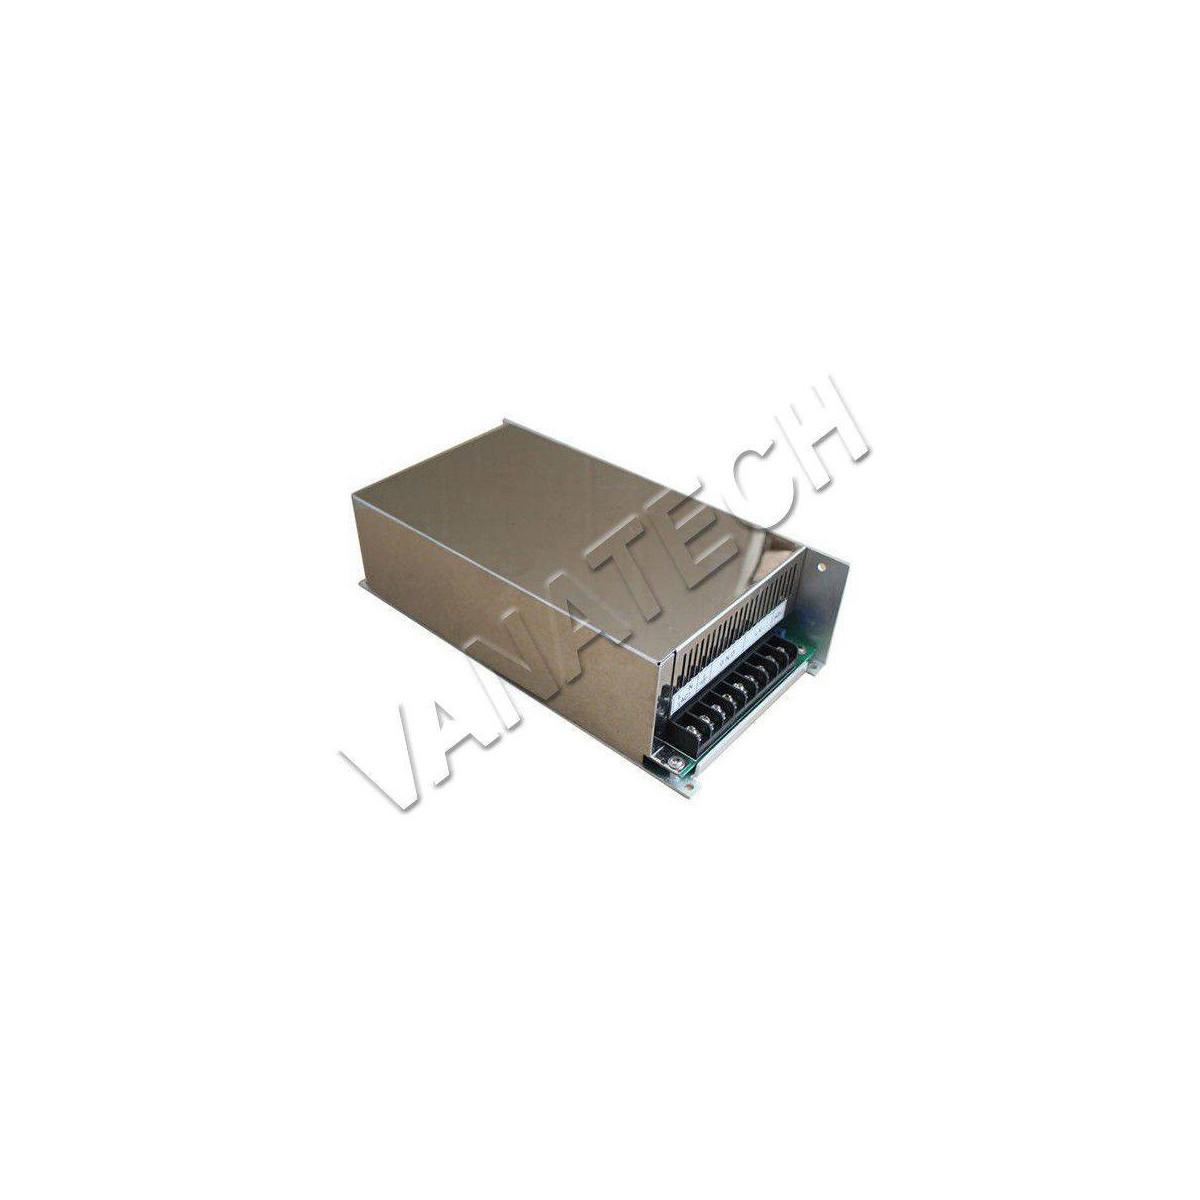 BATTERIA SAMSUNG GALAXY S2 i9100 GTi91000 EB-F1A2GBU 1650mAh ORIGINALE BULK